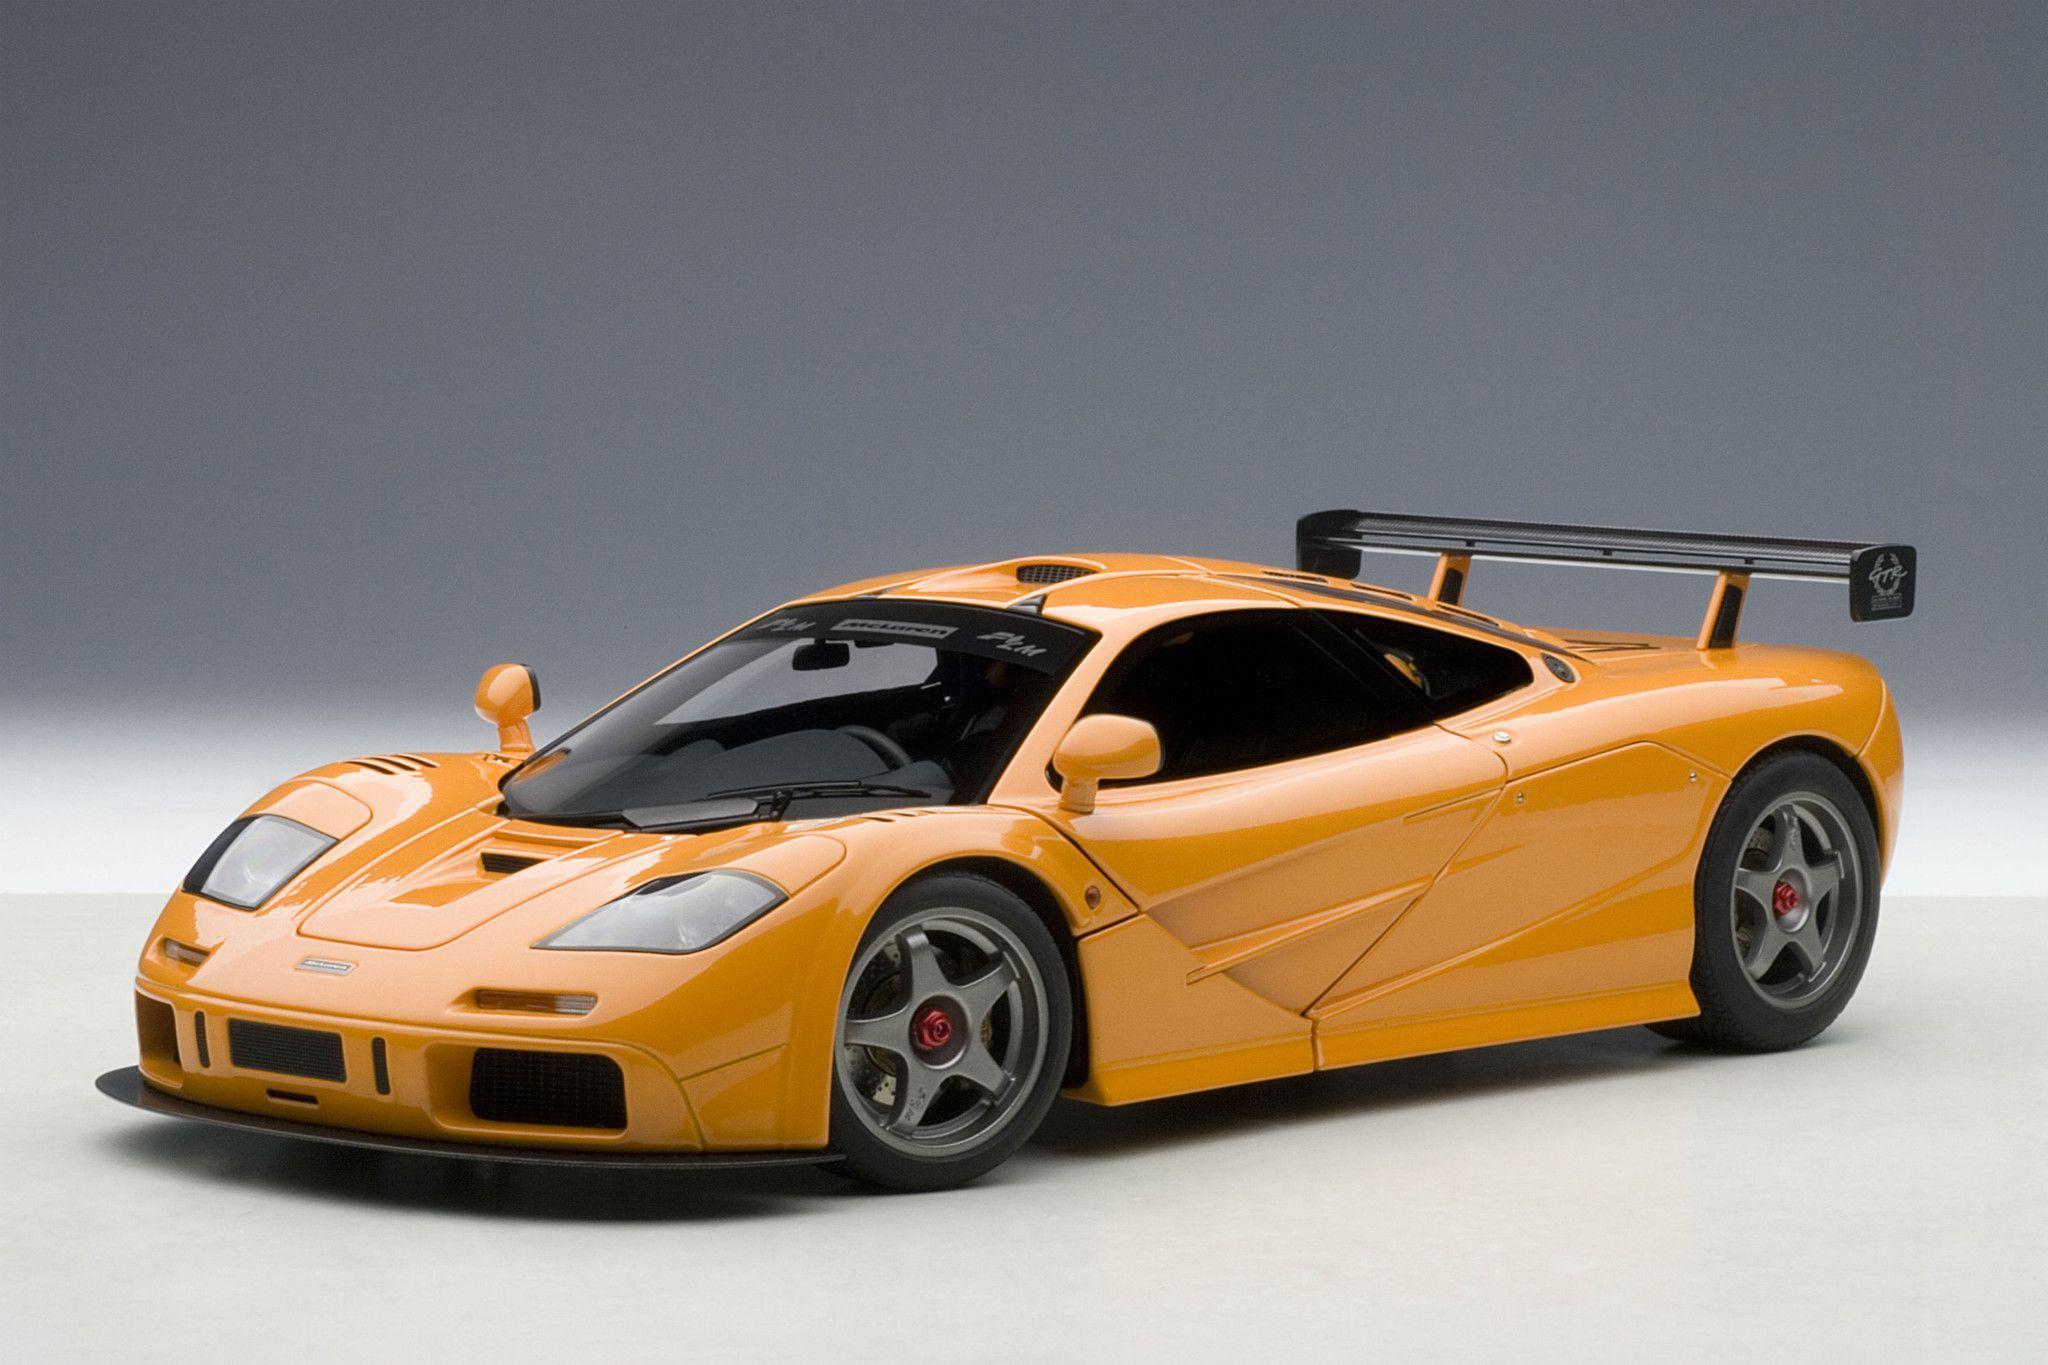 Mclaren F1 Lm Edition 1 18 Scale Diecast Model Car Diecast Model Cars Car Model Mclaren F1 Lm